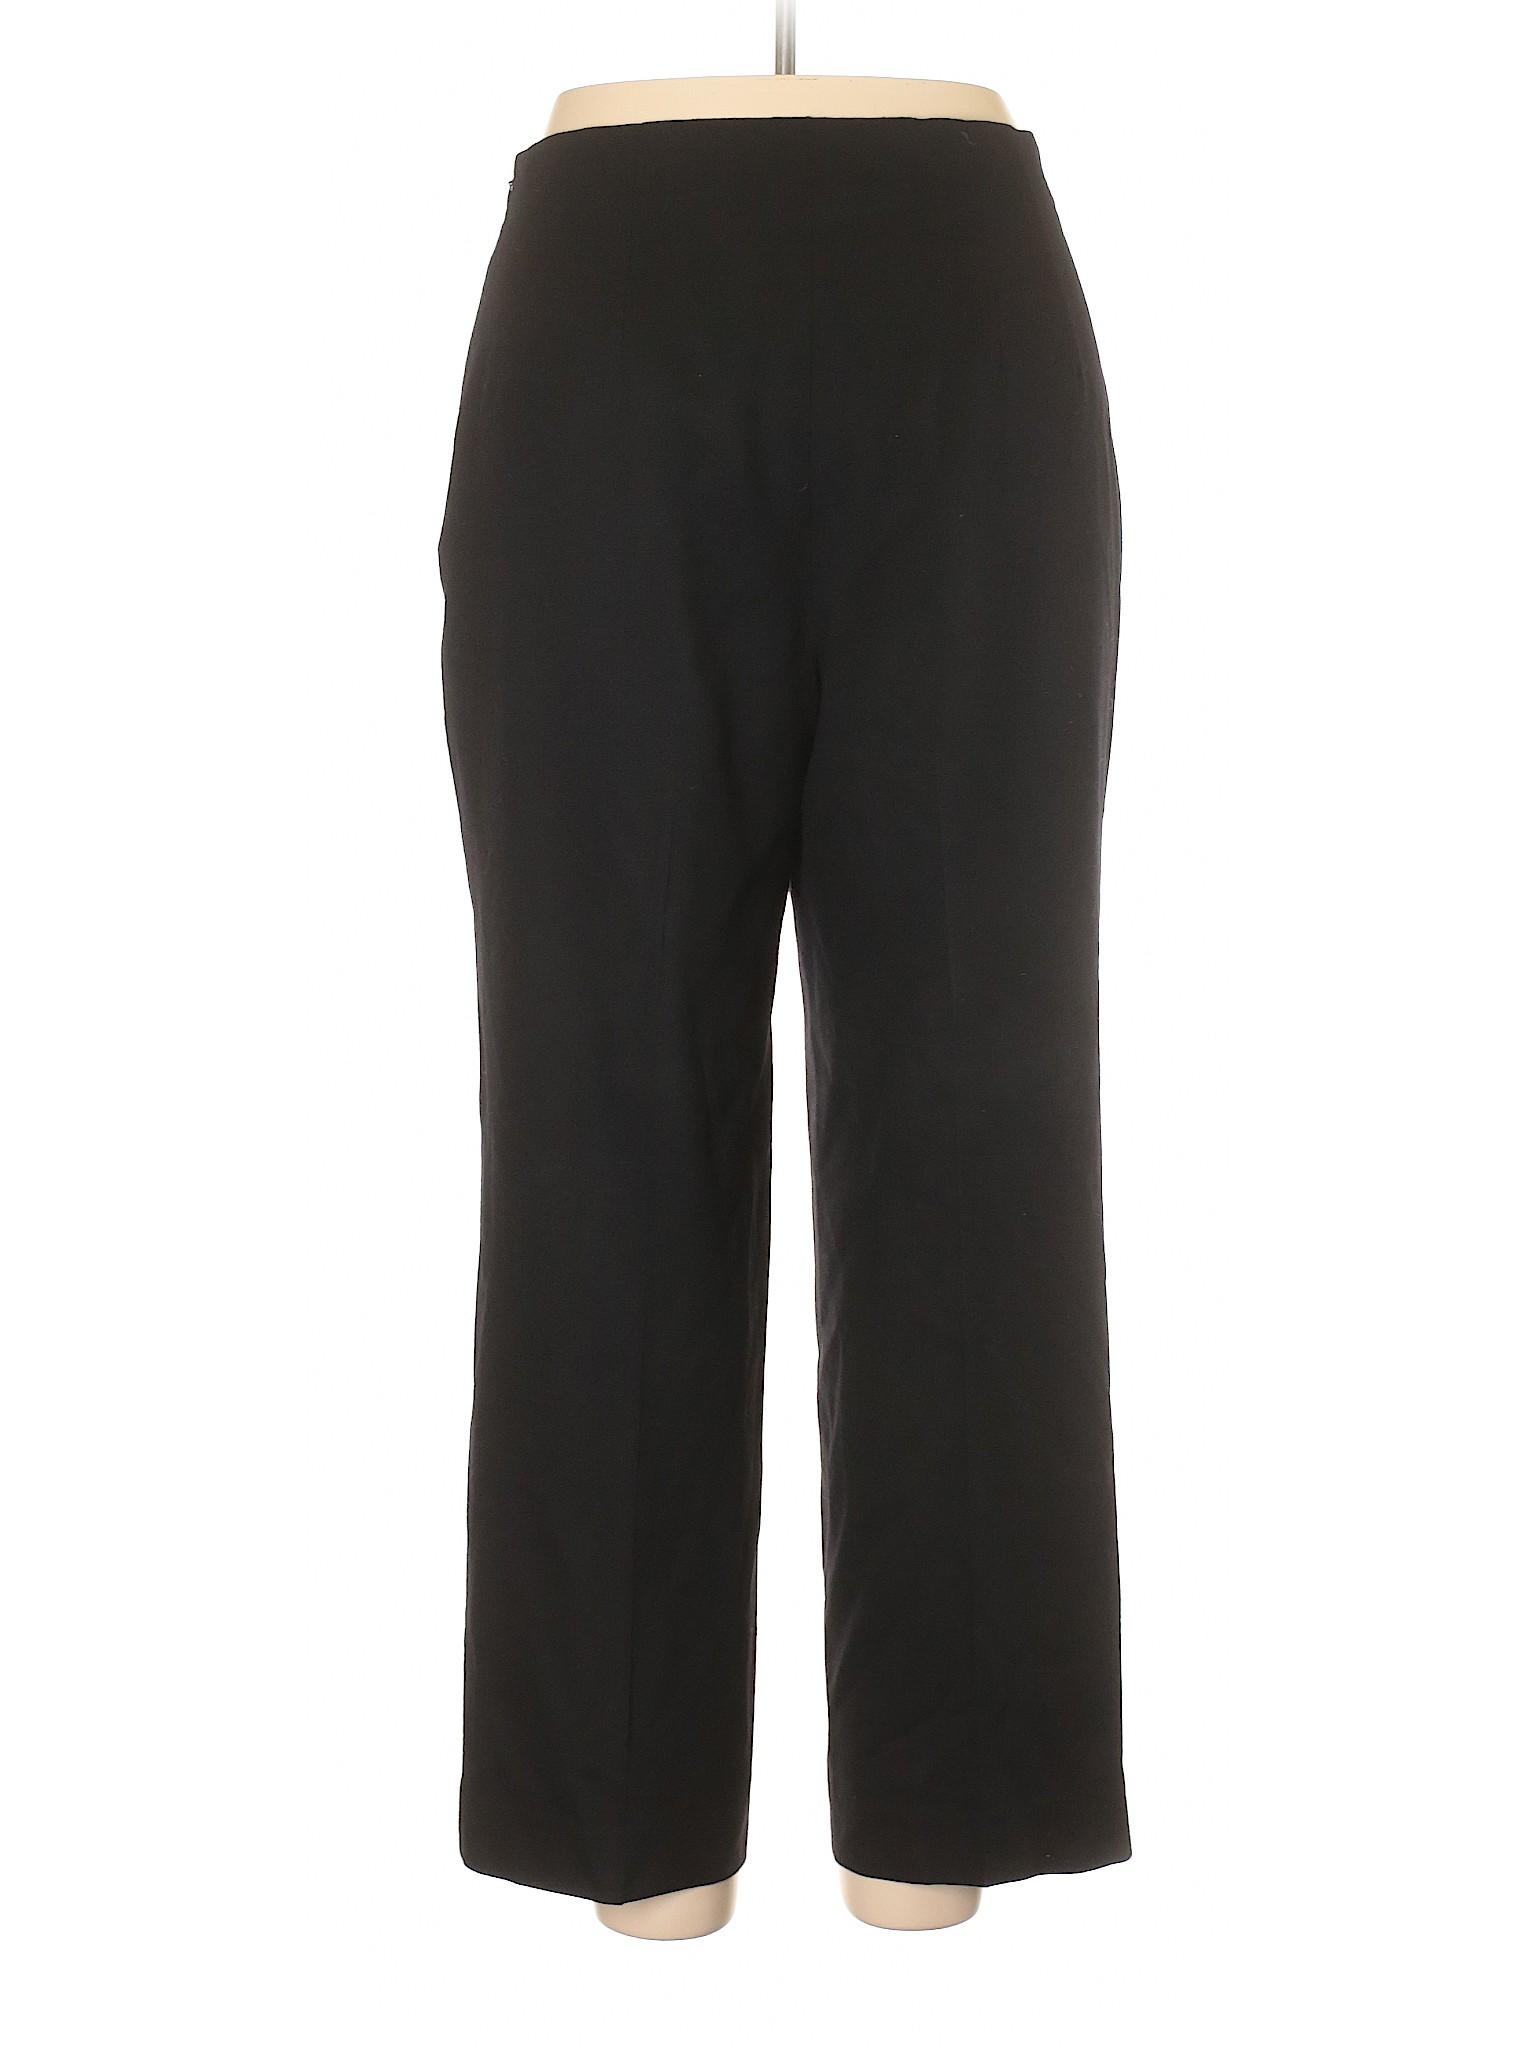 Pants Wool Boutique Leisure Boutique Leisure Talbots Sq4nX